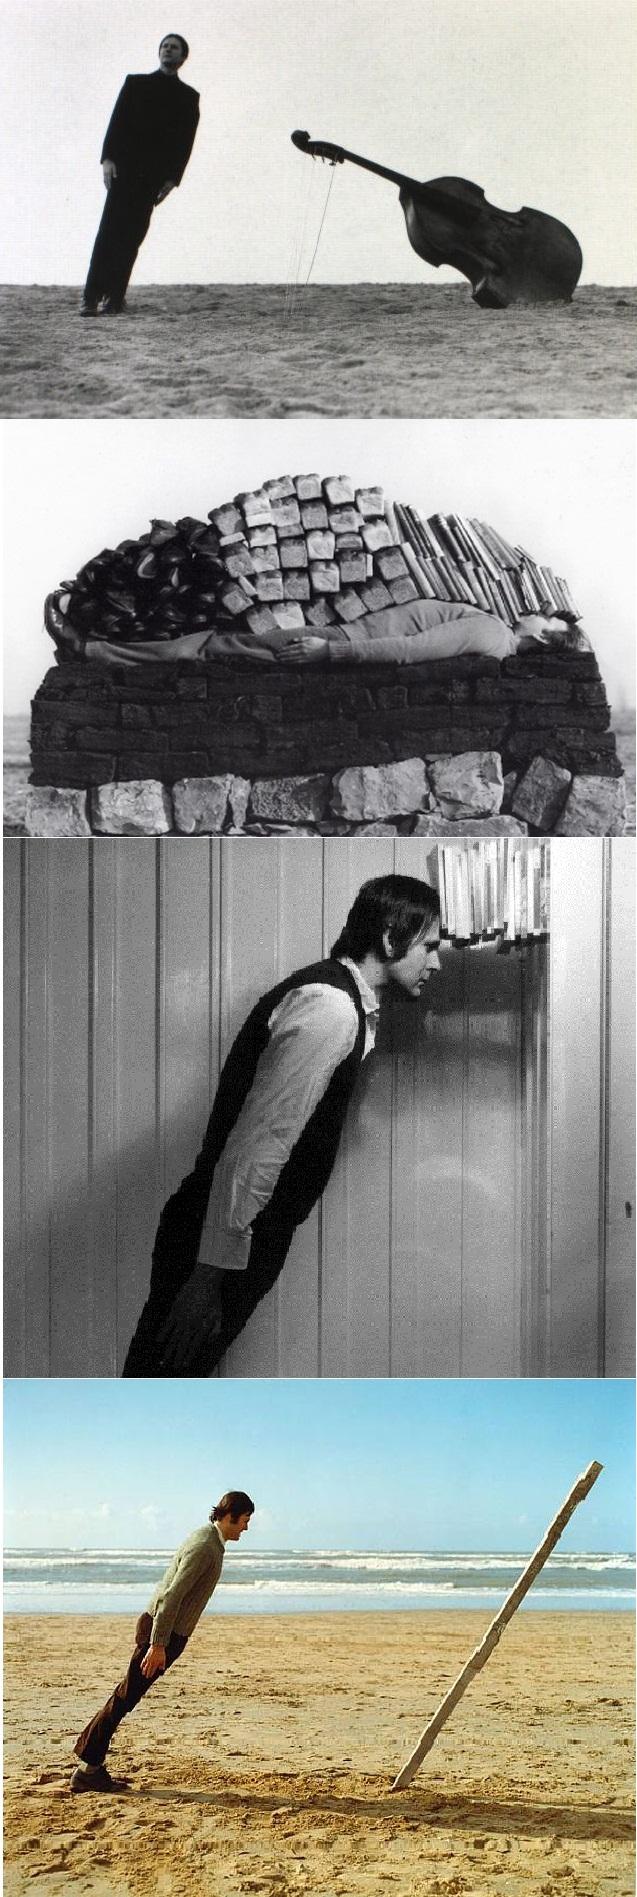 Sigurður Guðmundsson: Planking since the 70s.